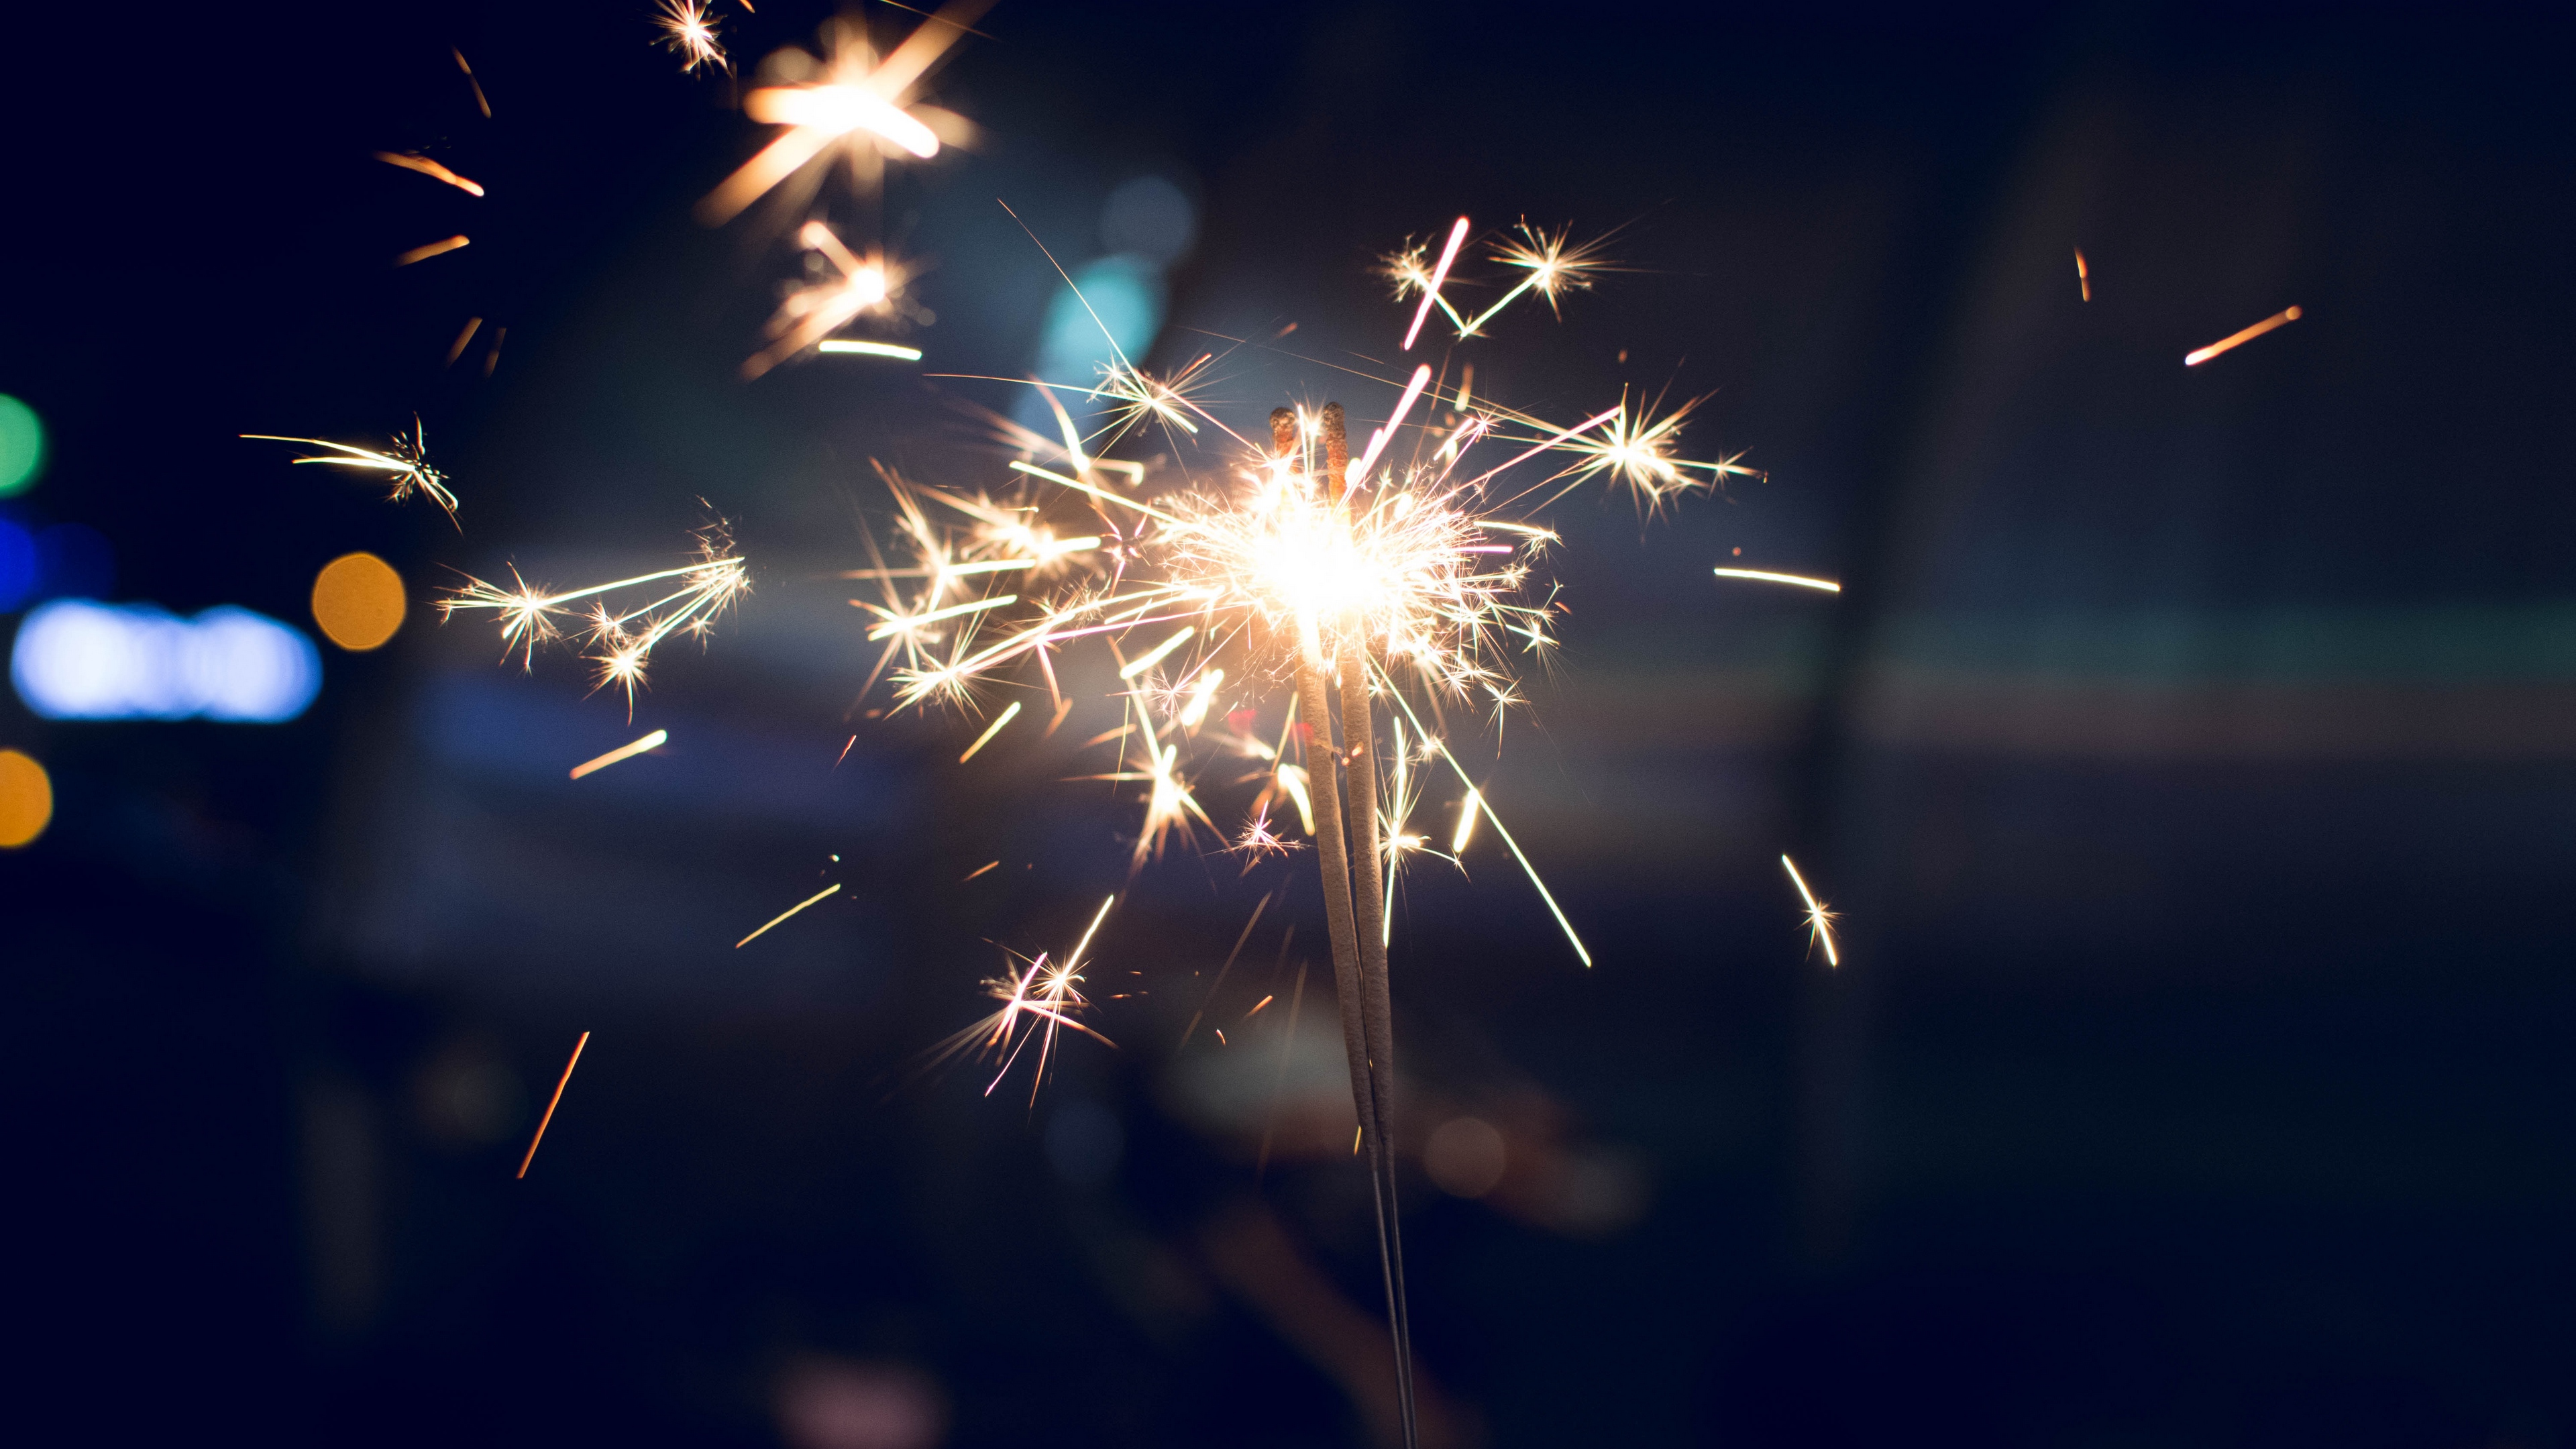 bengal fire sparks glitter blur dark background 4k 1538345083 - bengal fire, sparks, glitter, blur, dark background 4k - Sparks, Glitter, bengal fire